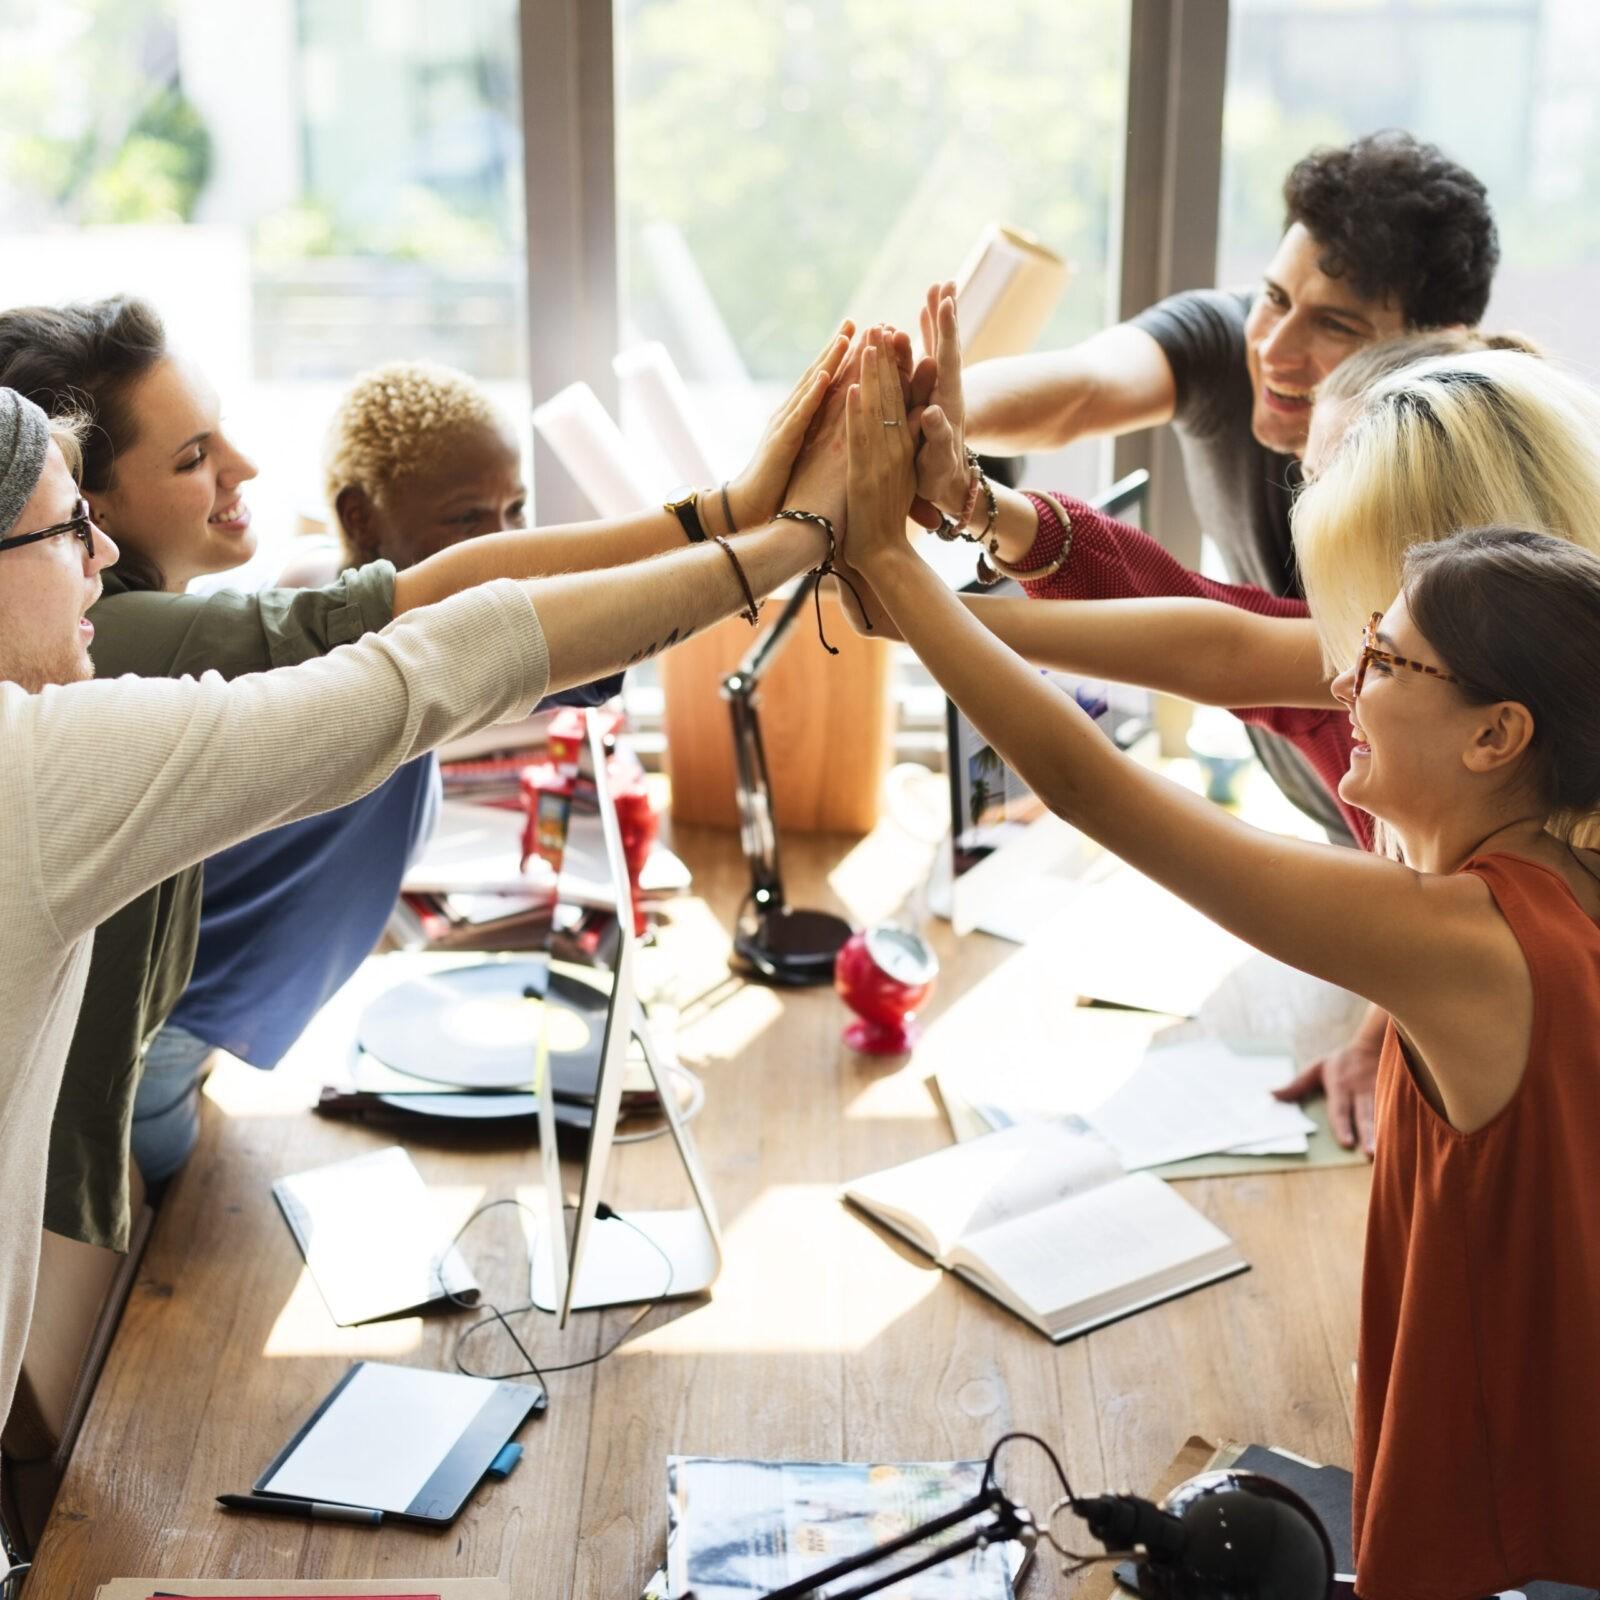 Teamwork Power Successful Meeting Workplace